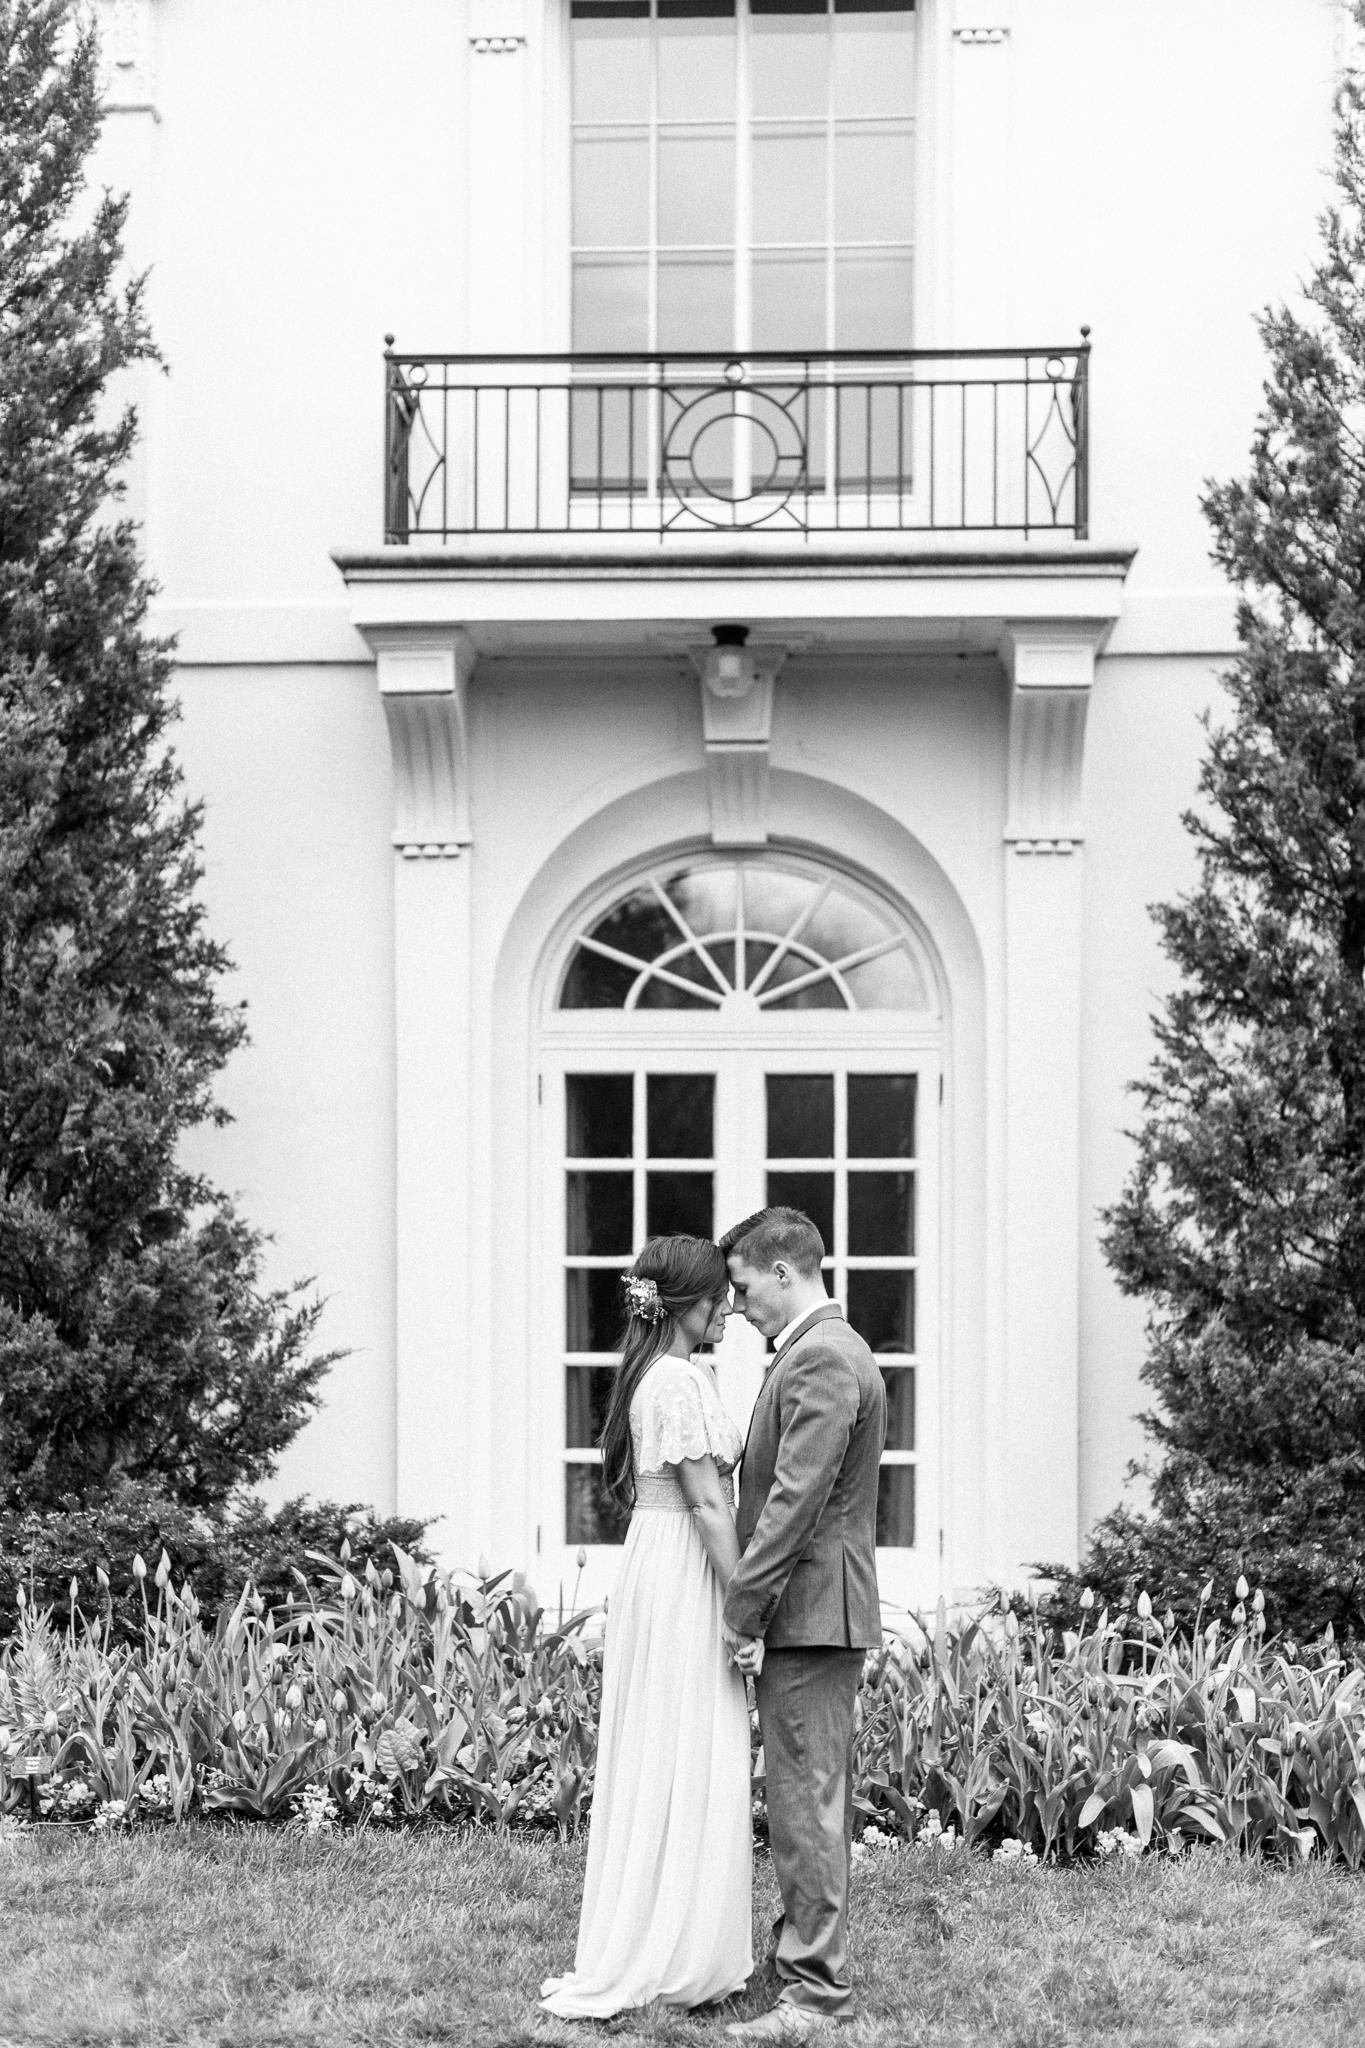 Newfields Engagement Session IMA Indianapolis Museum of Art Wedding Photos Photographer-74.jpg